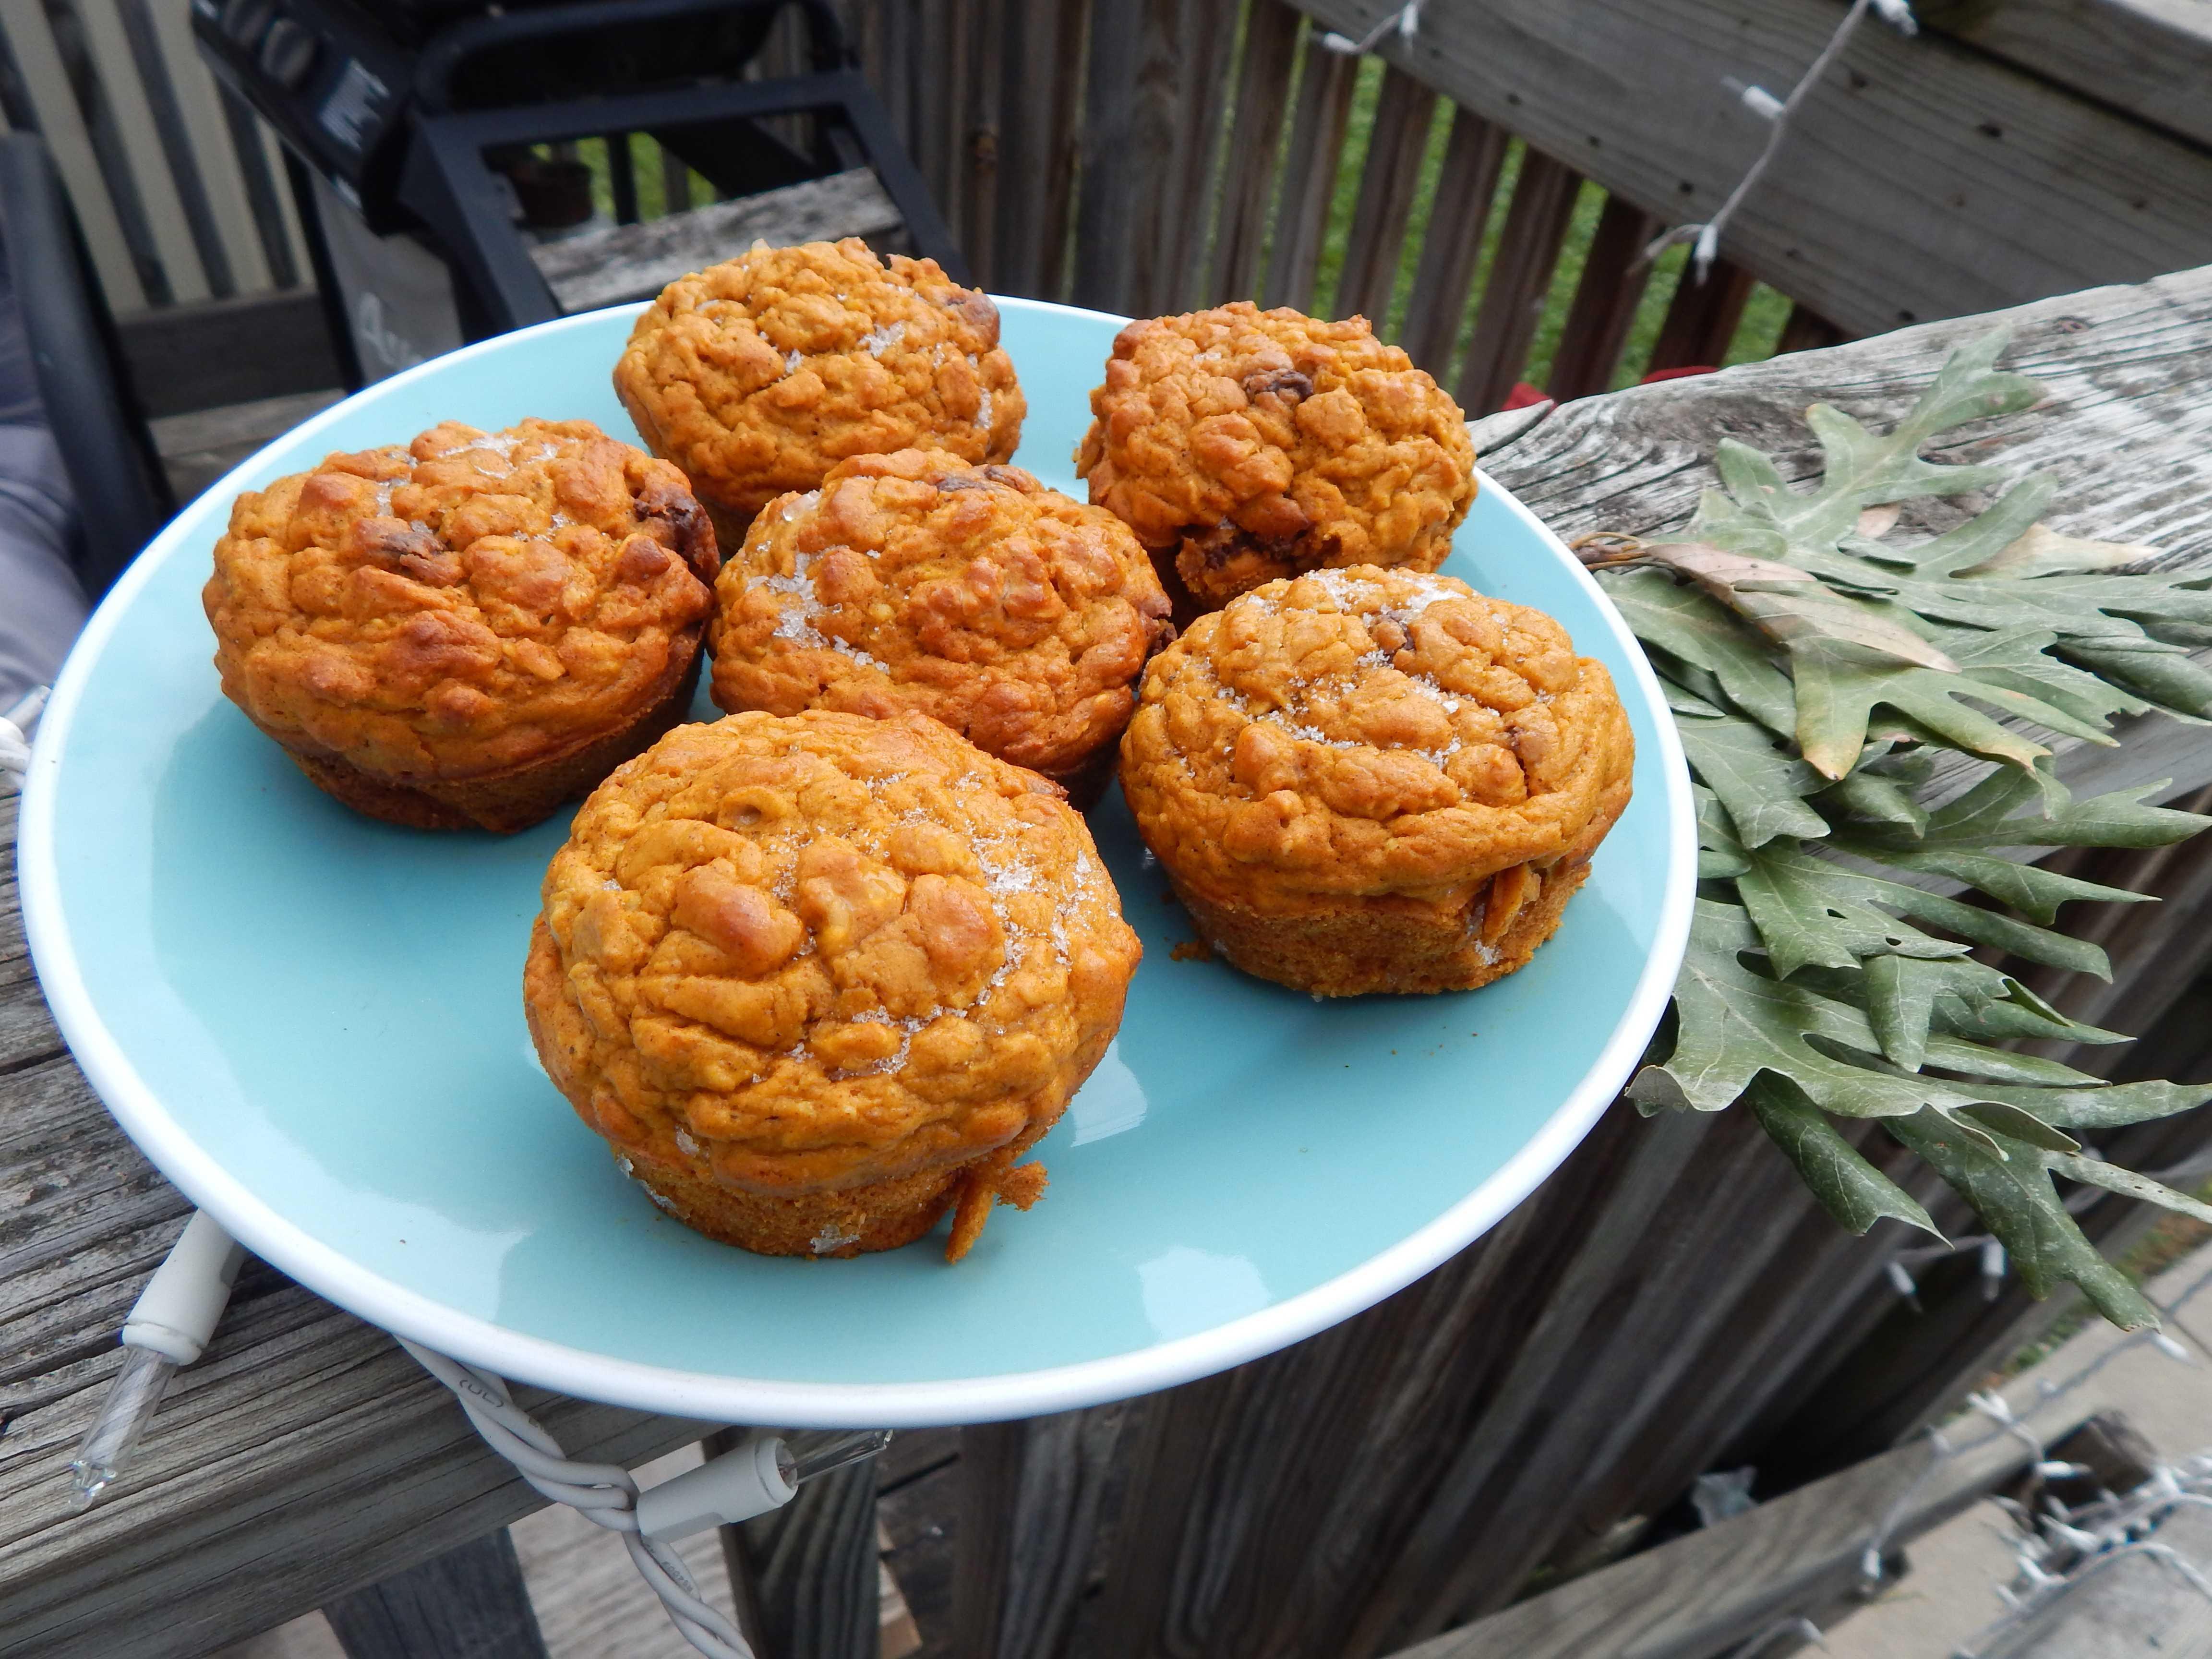 Market Plunder: Hopping on the pumpkin spice haywagon – back to basics